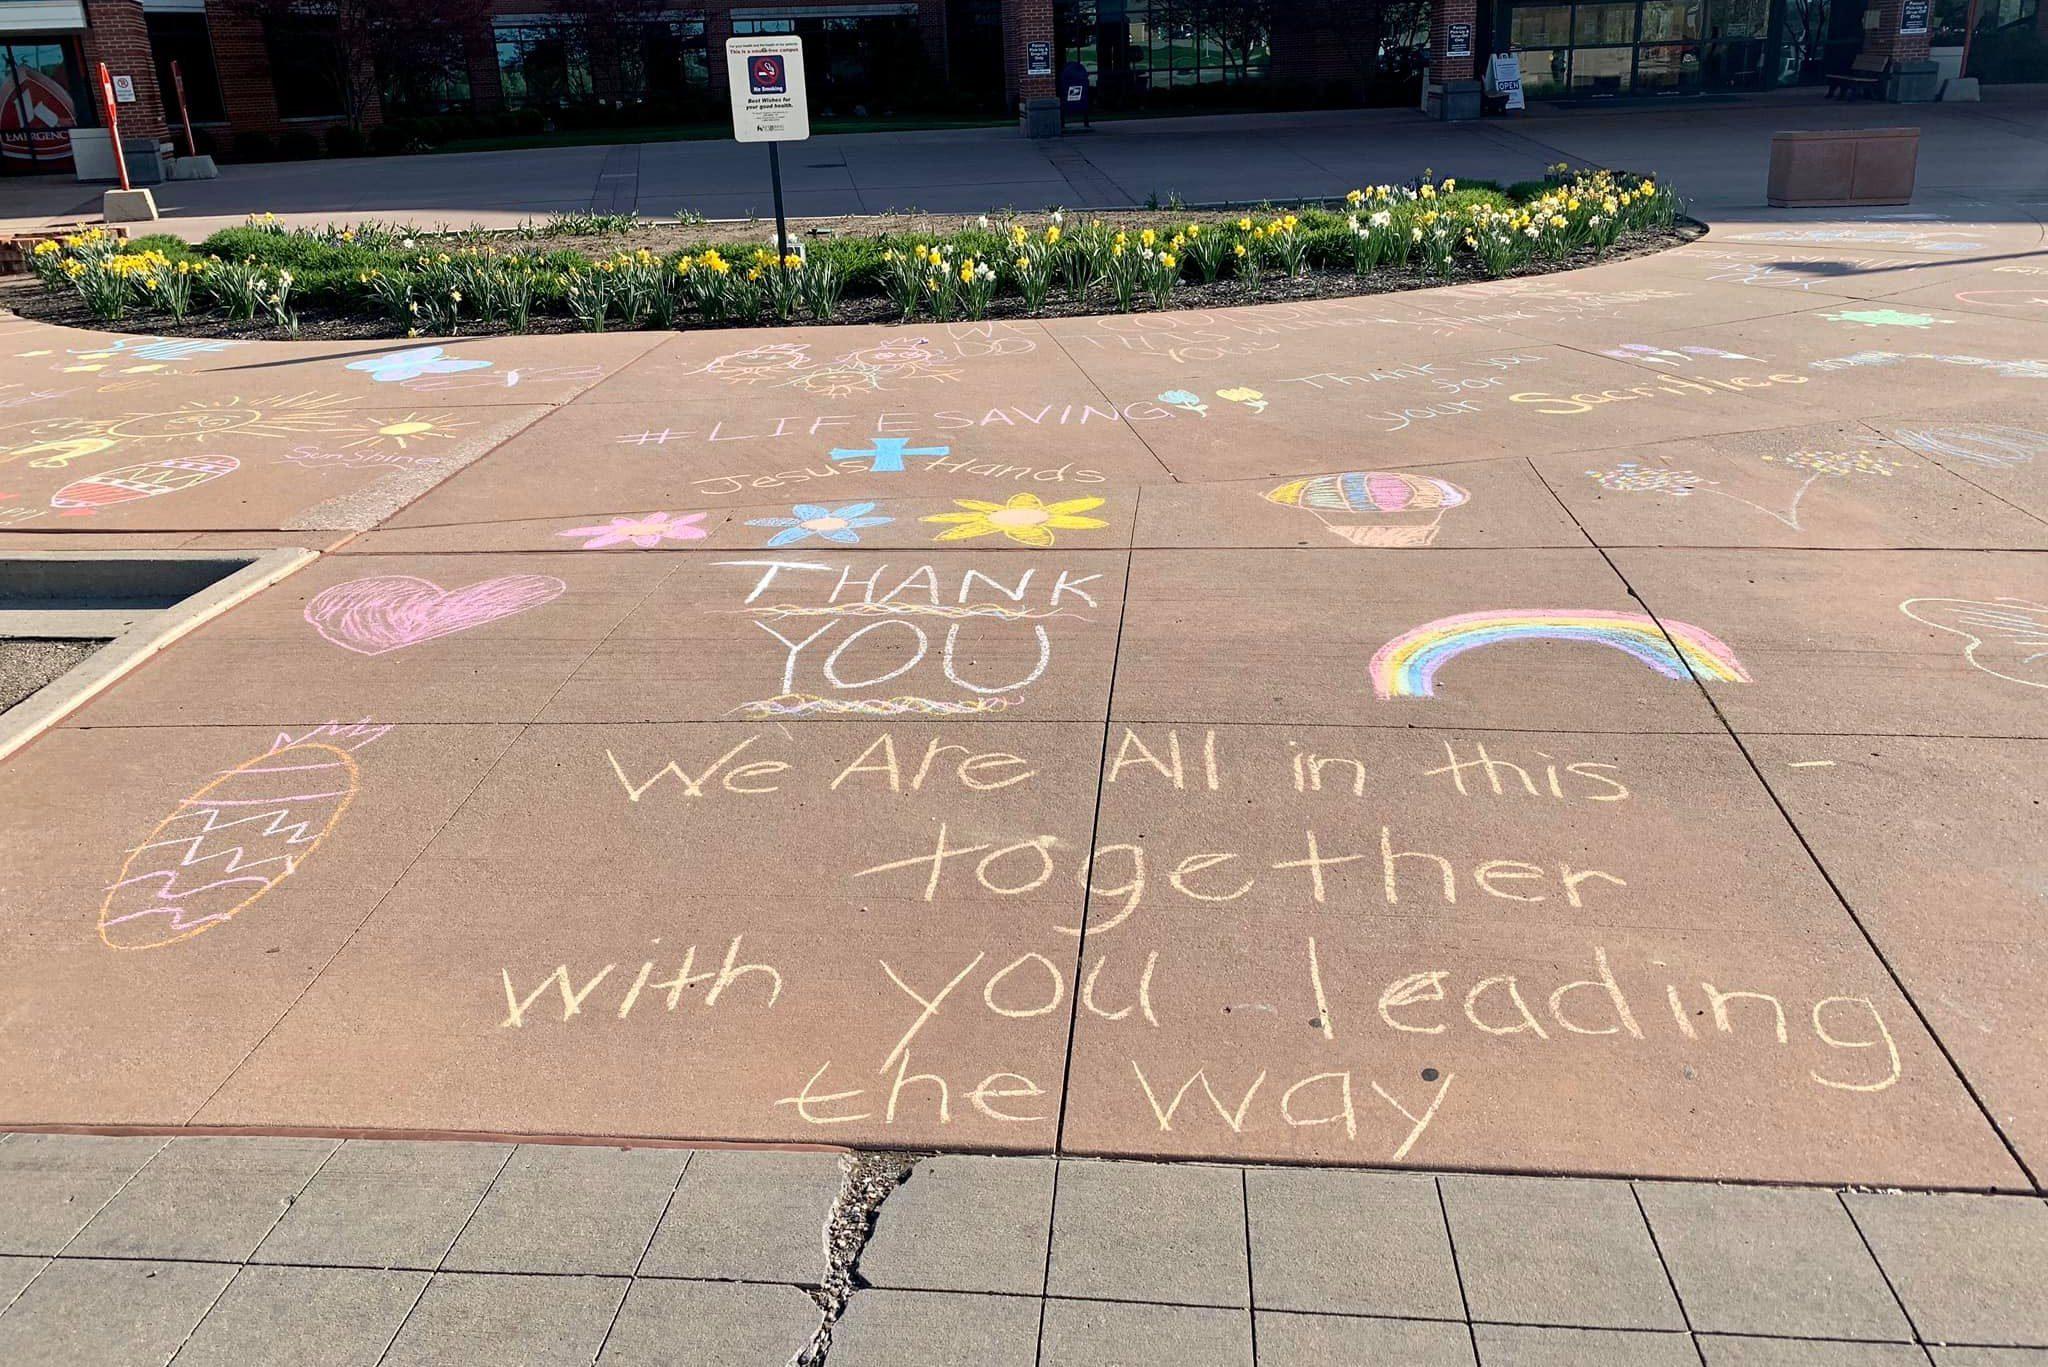 Message of kindness drawn on sidewalk in chalk